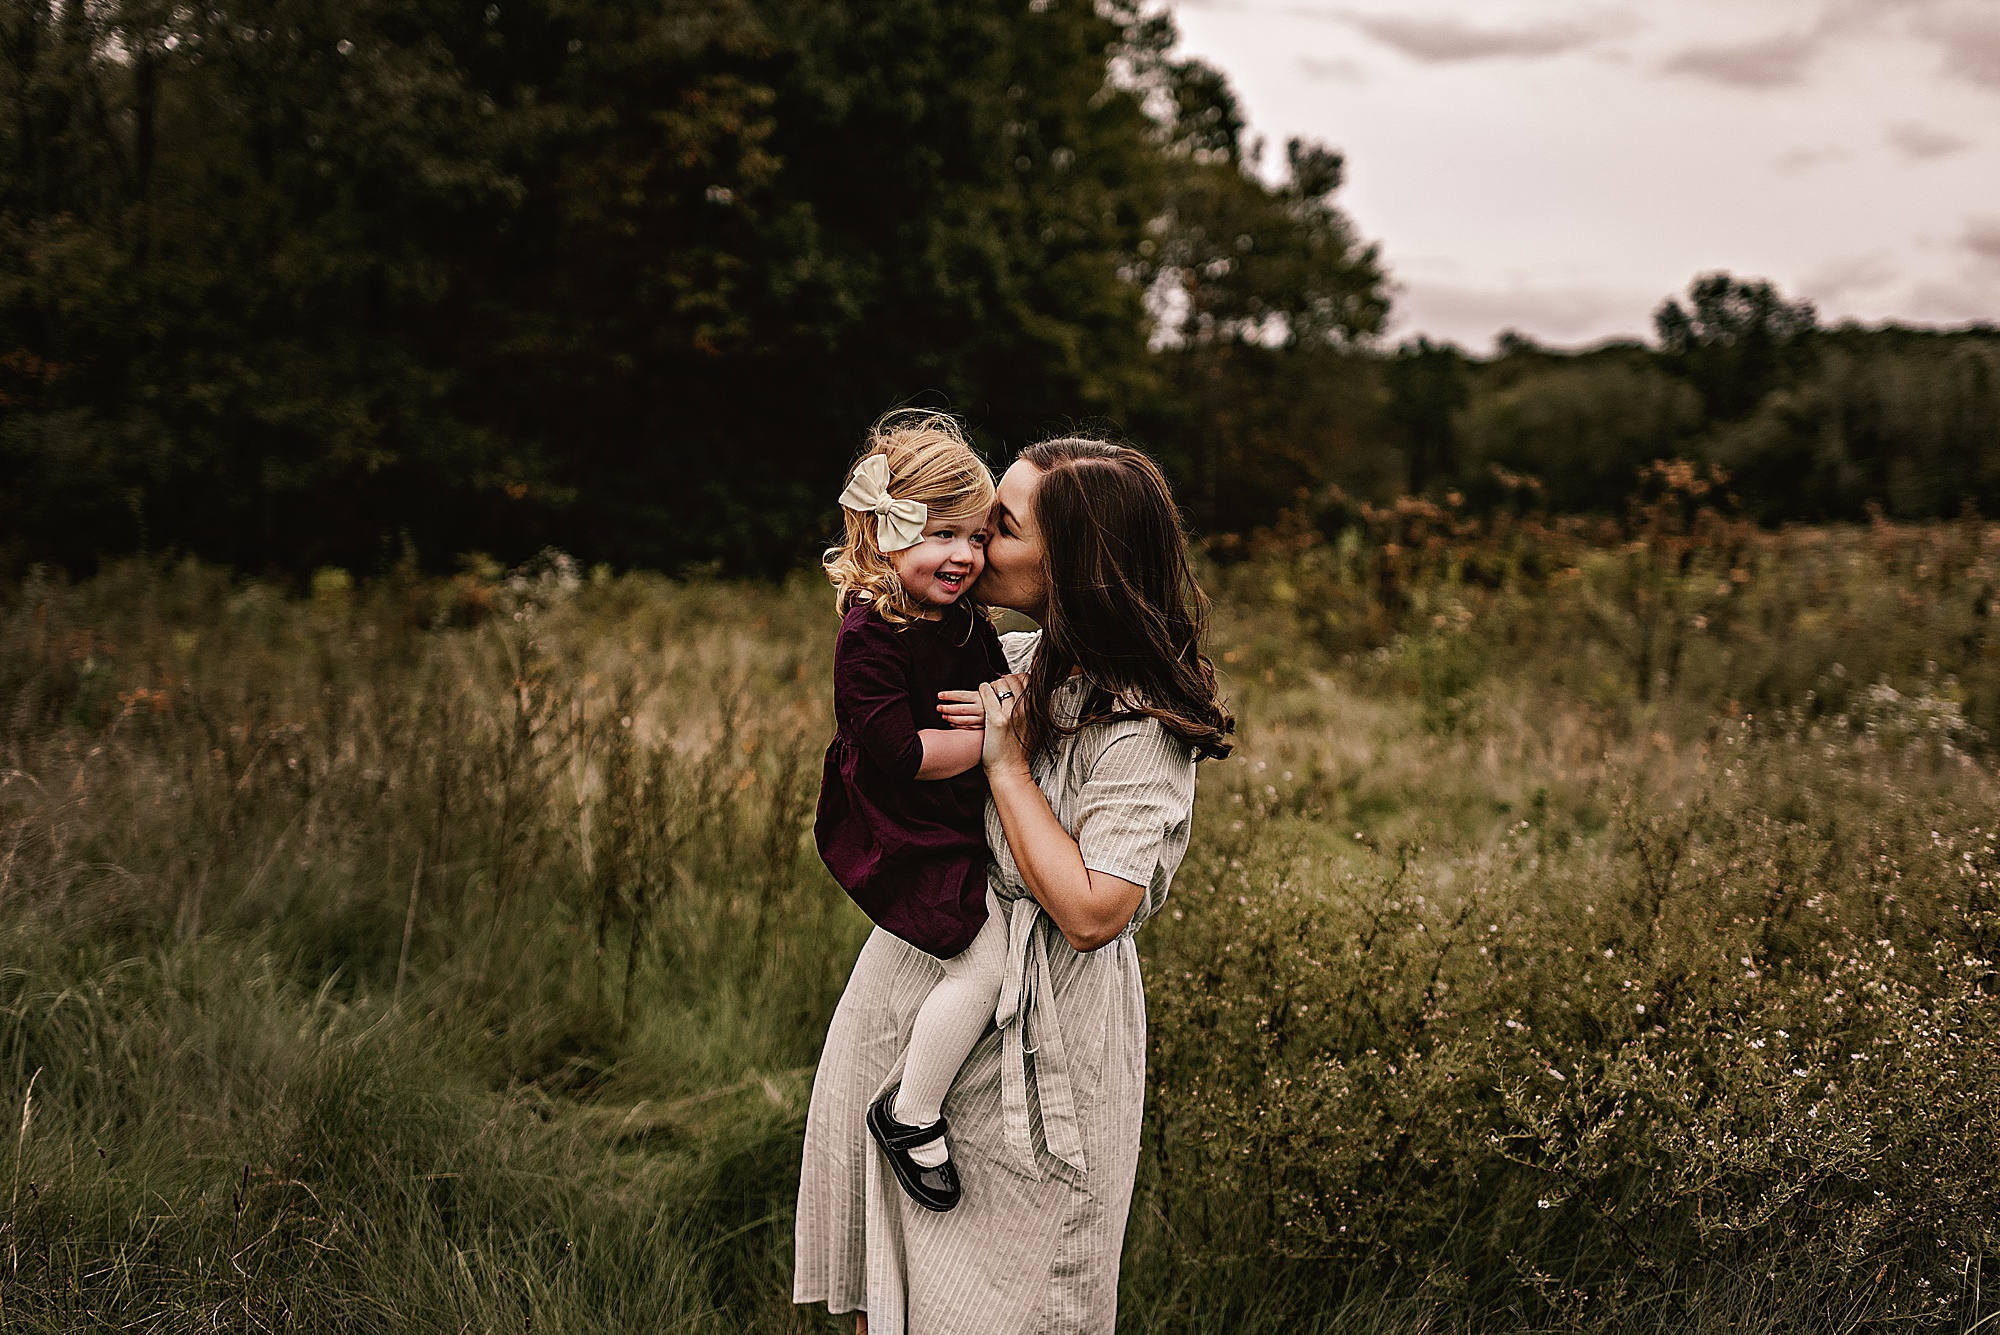 lauren-grayson-photography-akron-ohio-maternity-session-fall-hammer_0041.jpg